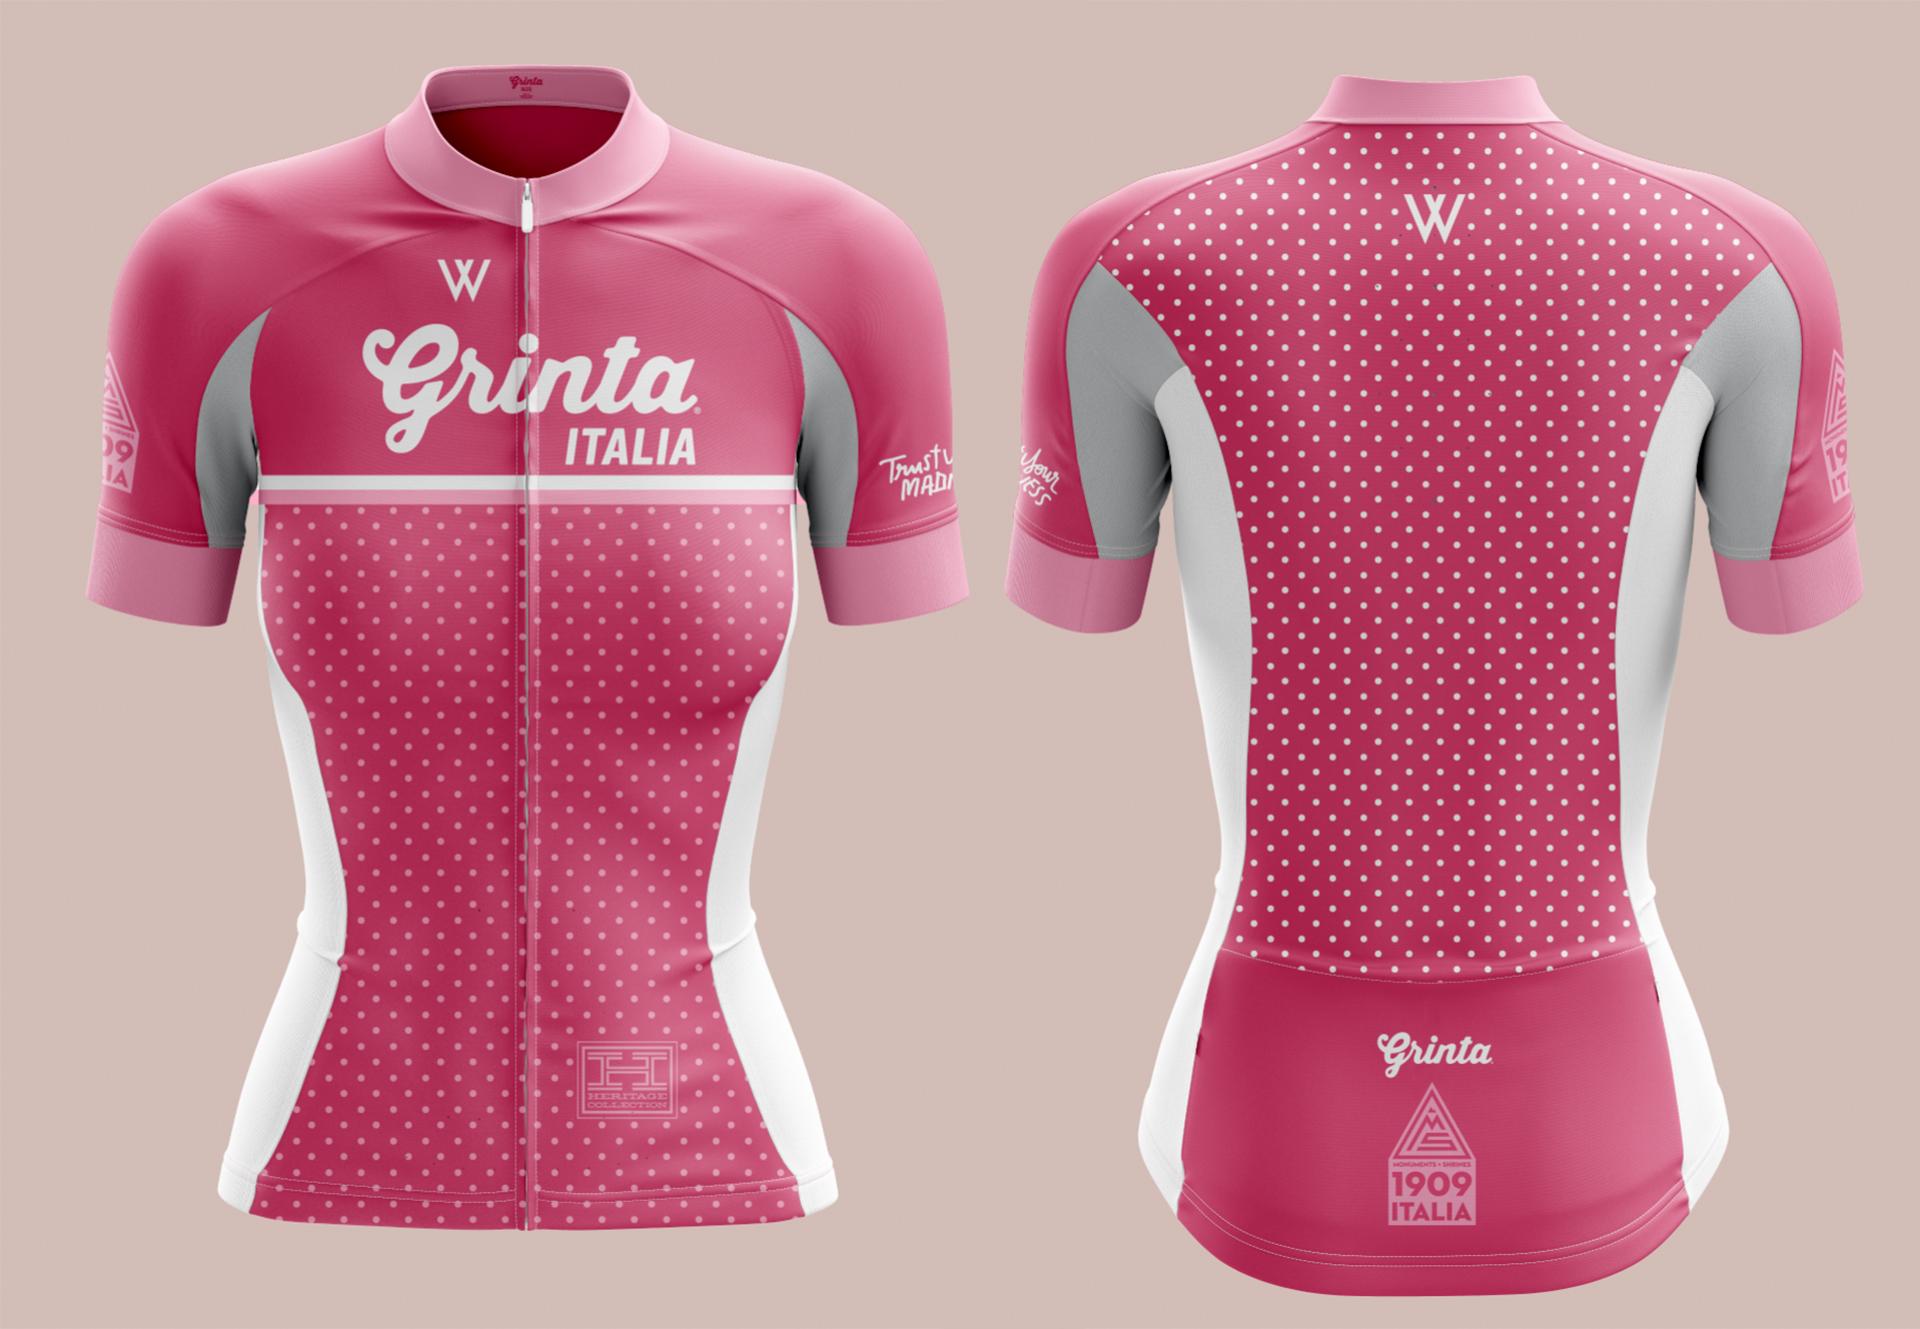 grinta-jersey-women-italia-pink-giro.jpg